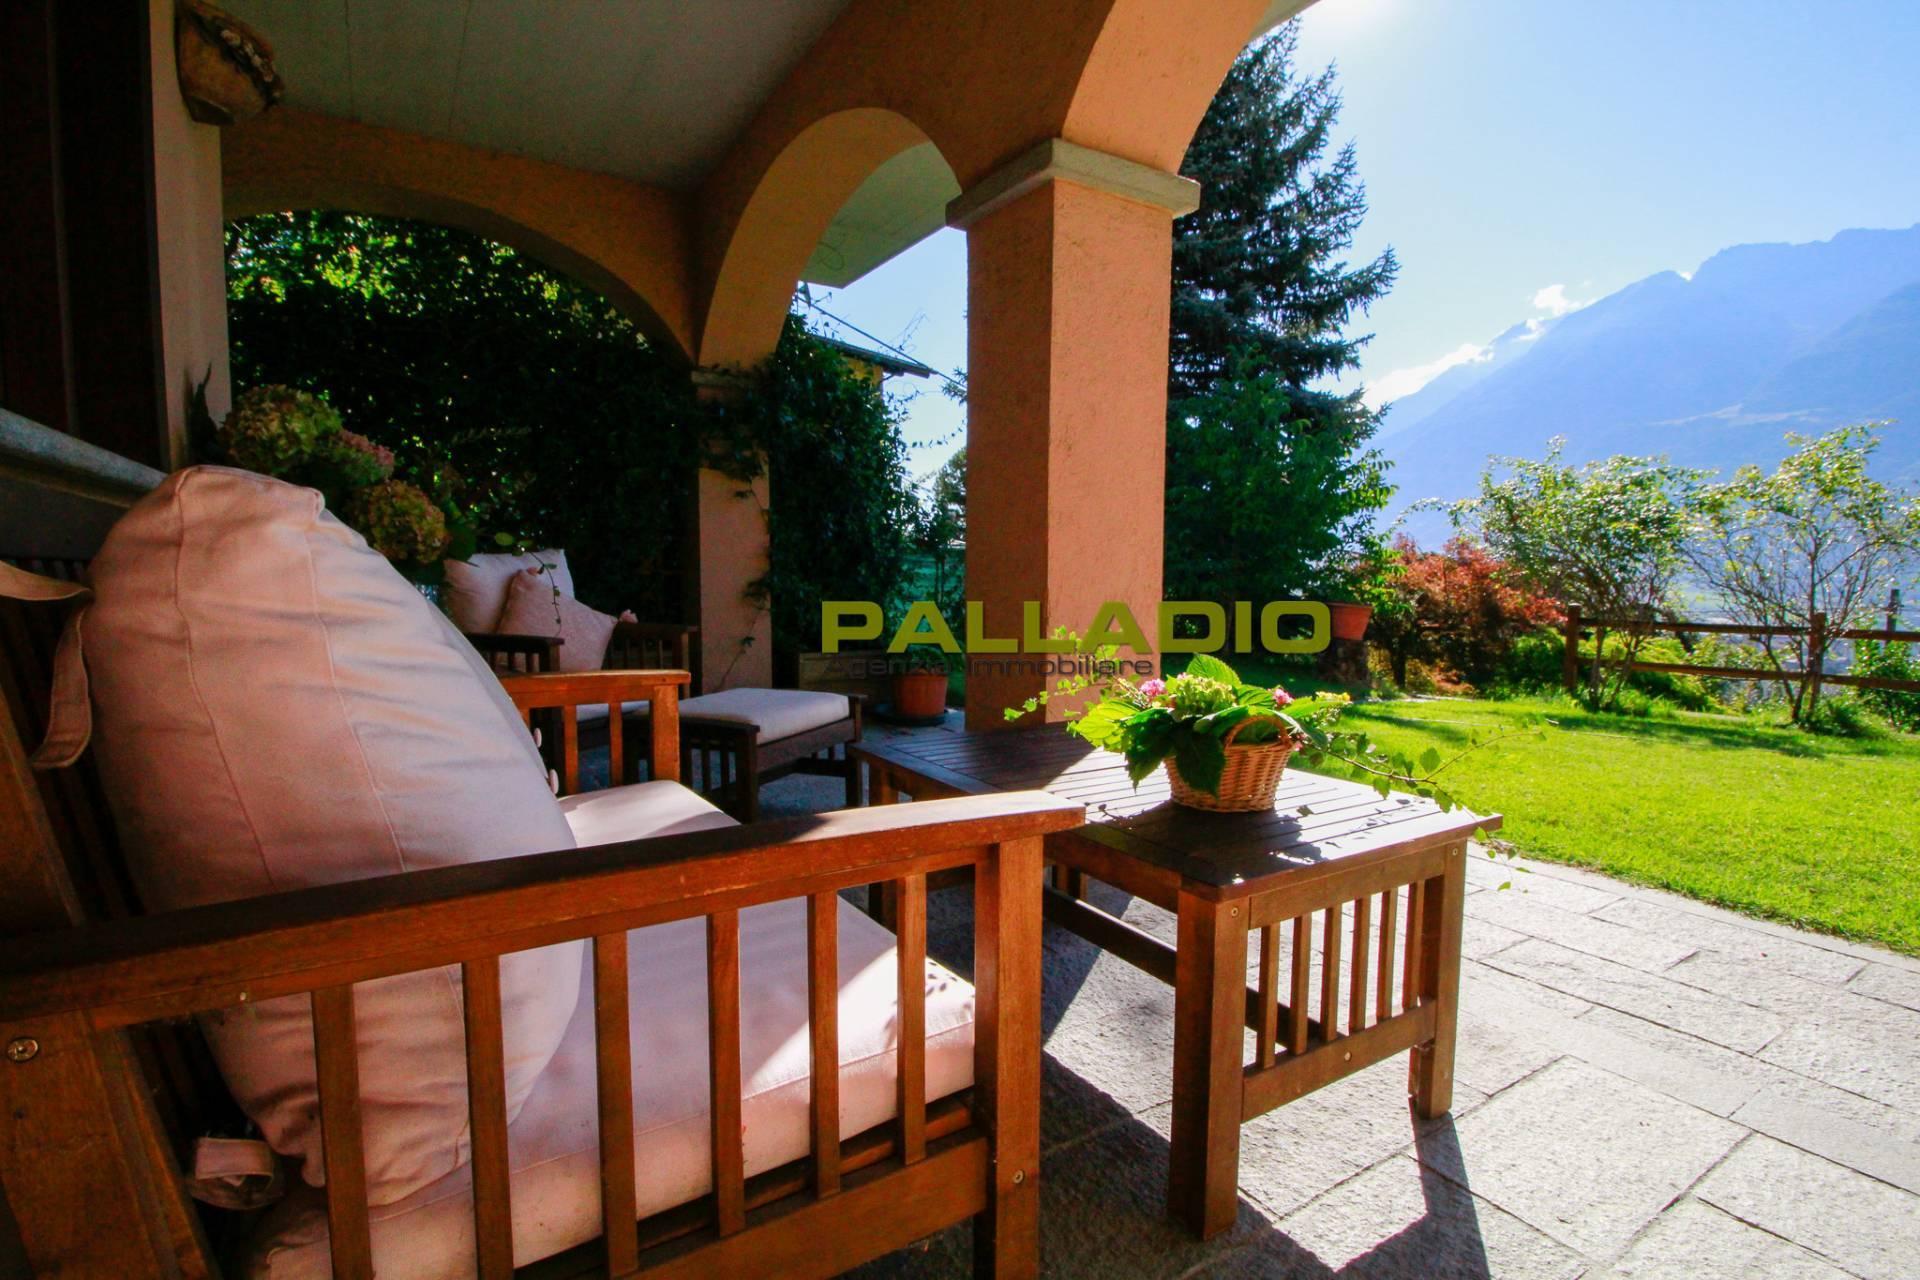 Villetta in vendita a Aosta (AO)